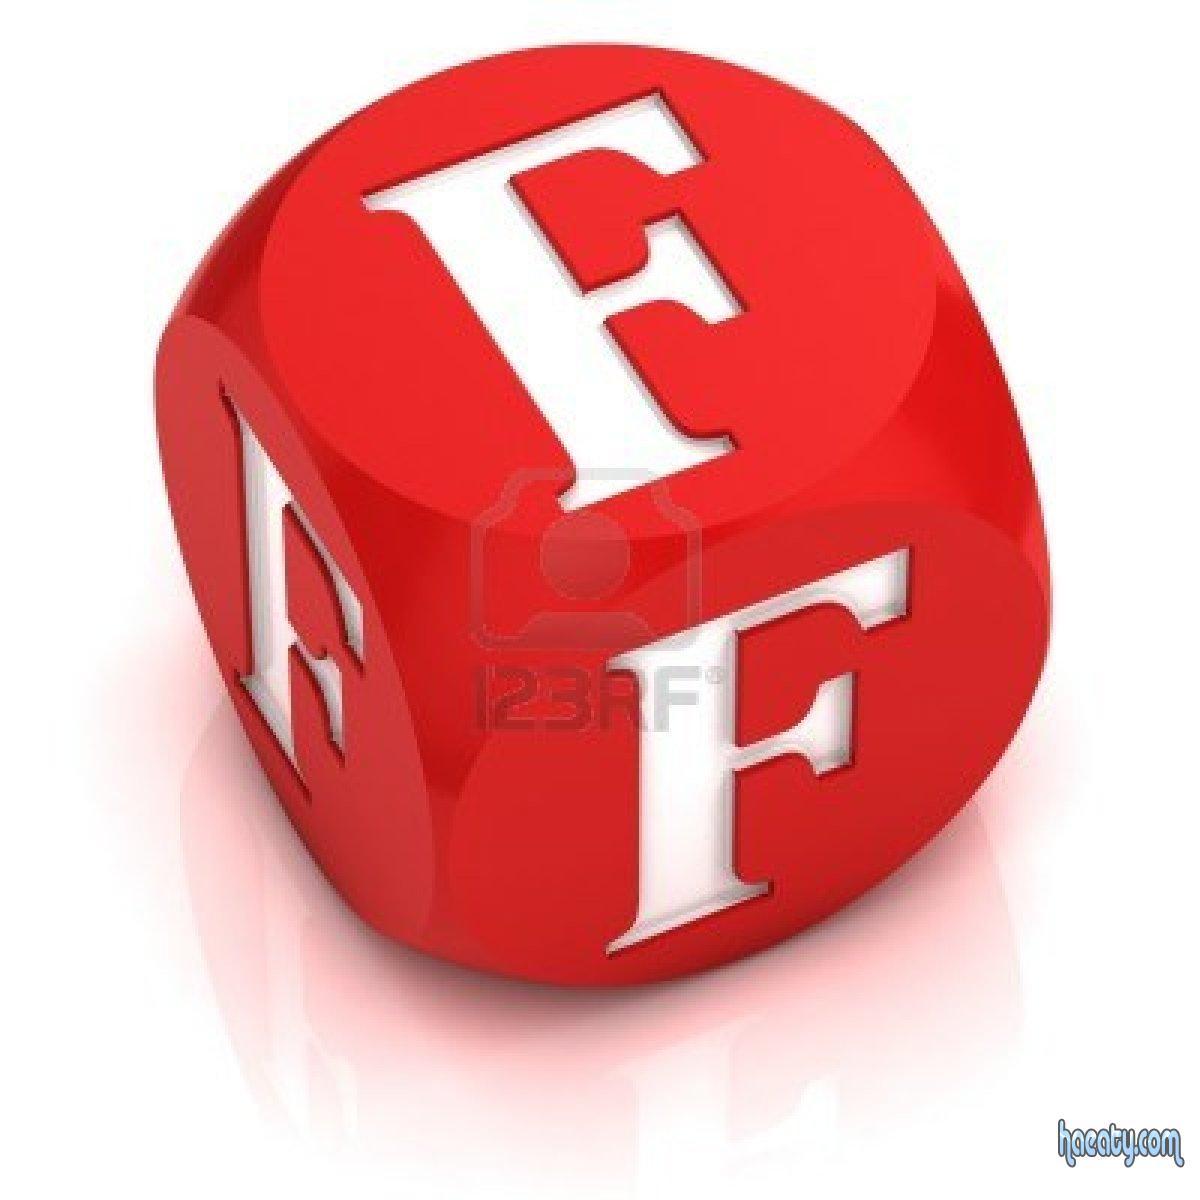 صور حرف F , صور حرف F مزخرفة , خلفيات جديدة 2016 letter F pictures